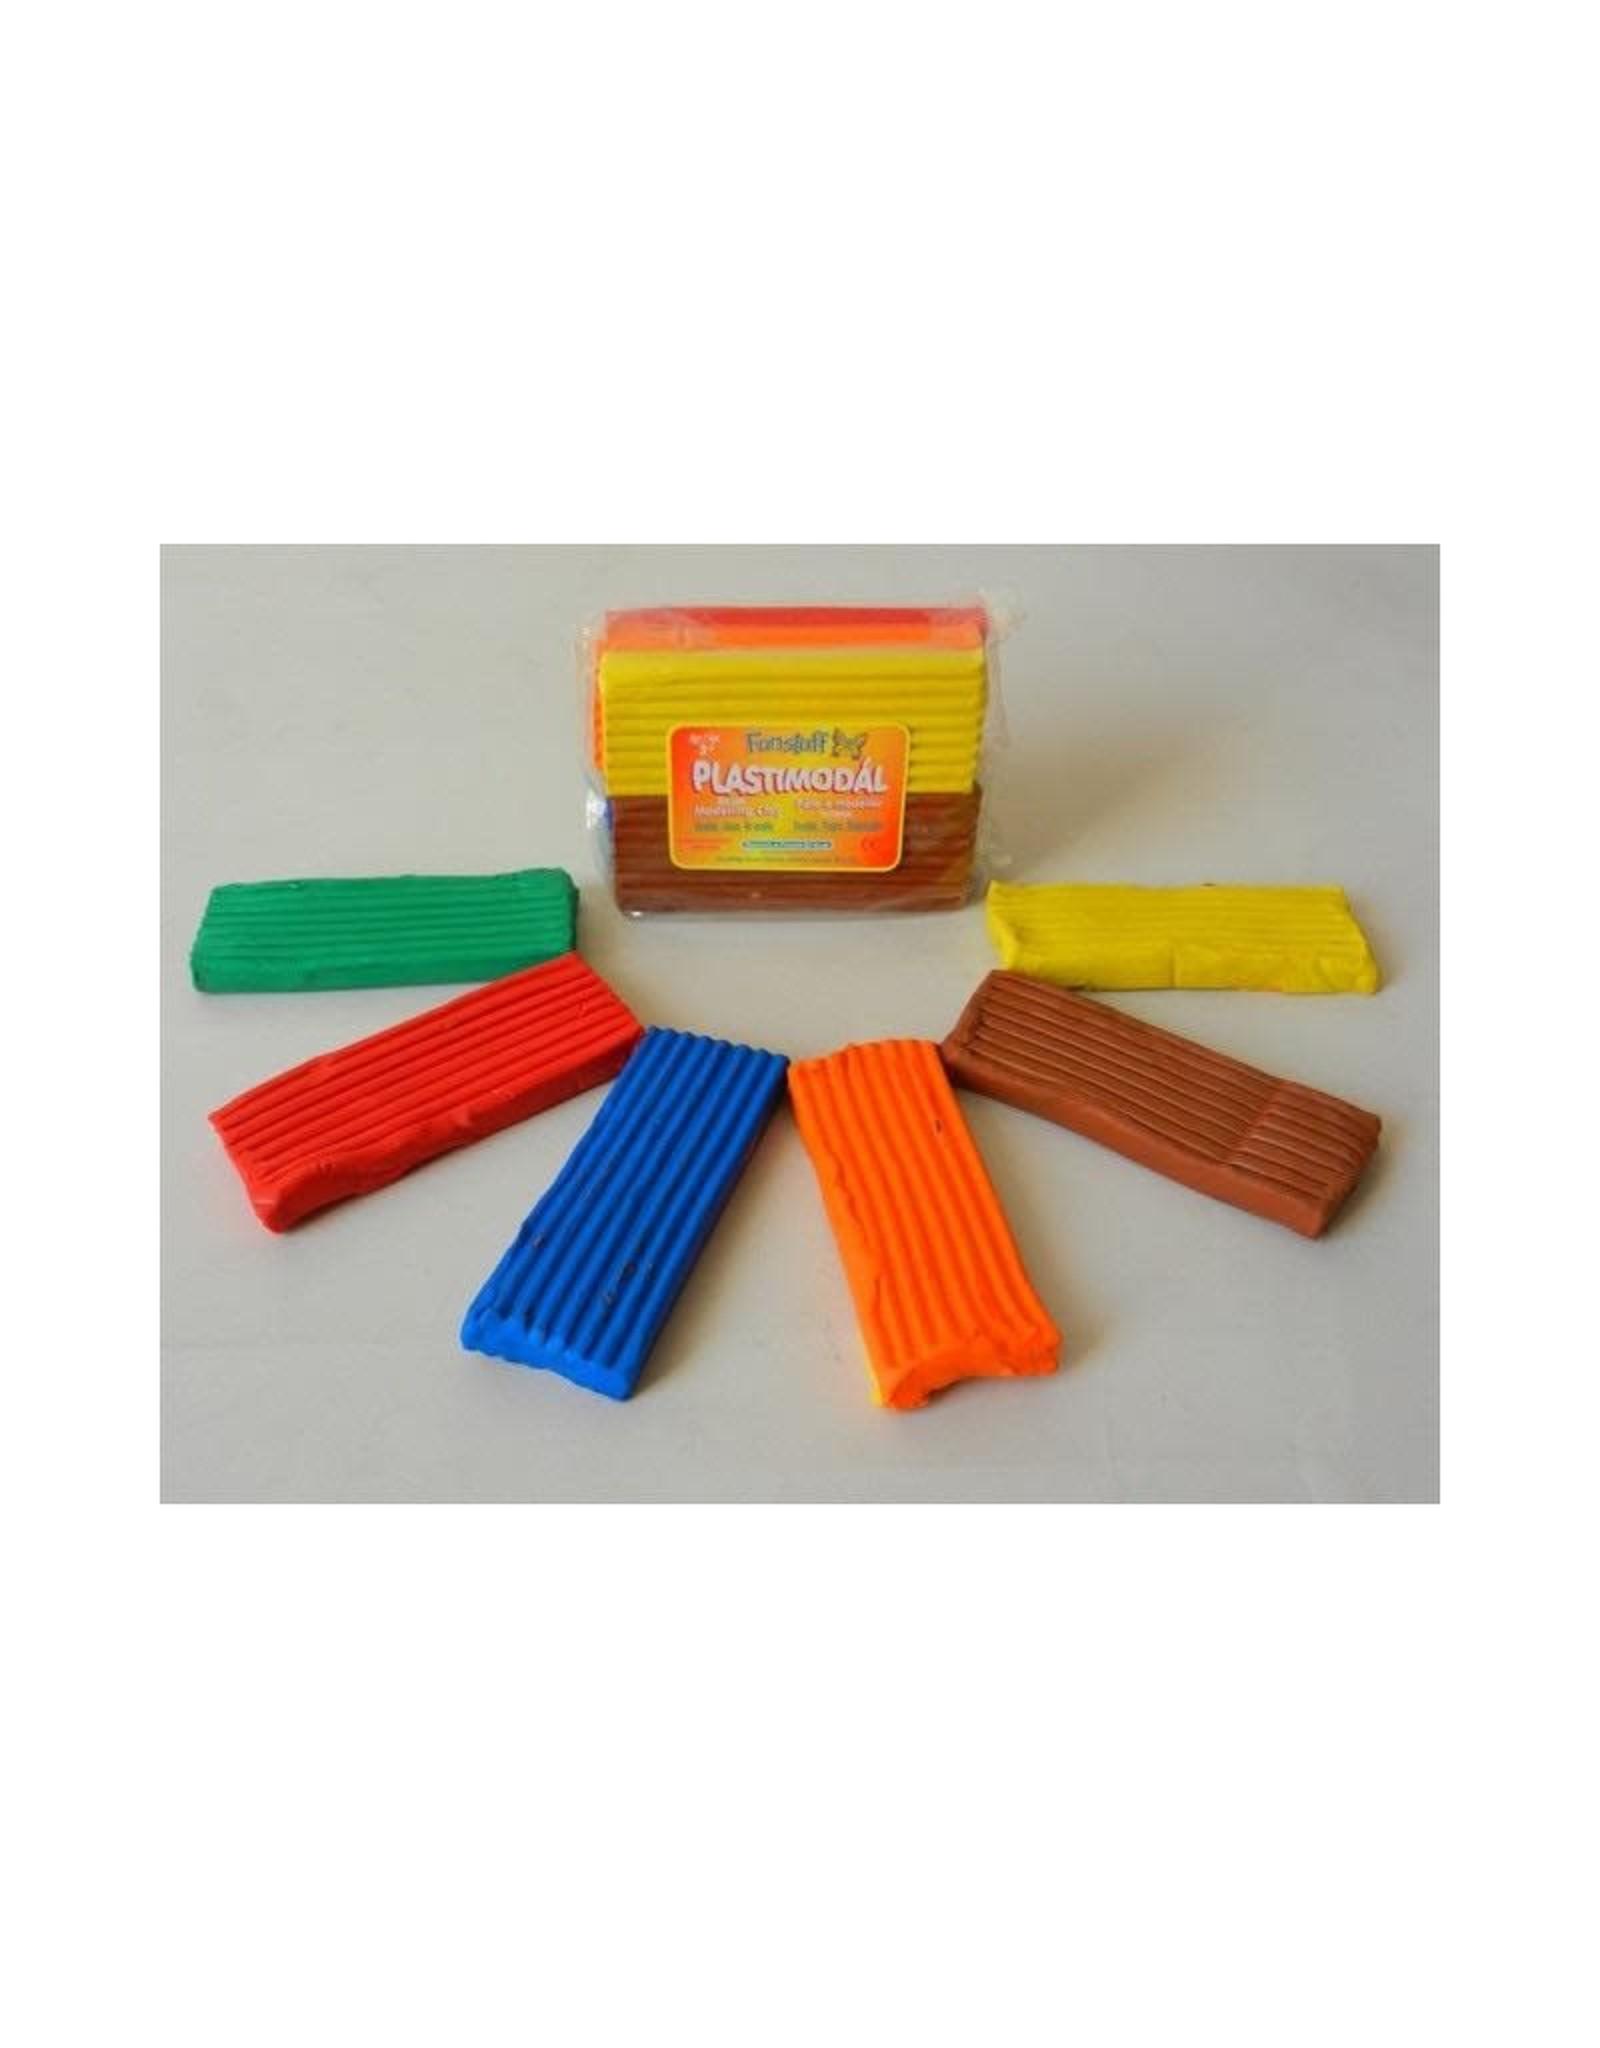 Funstuff Plastimodal Modelling Clay 500g